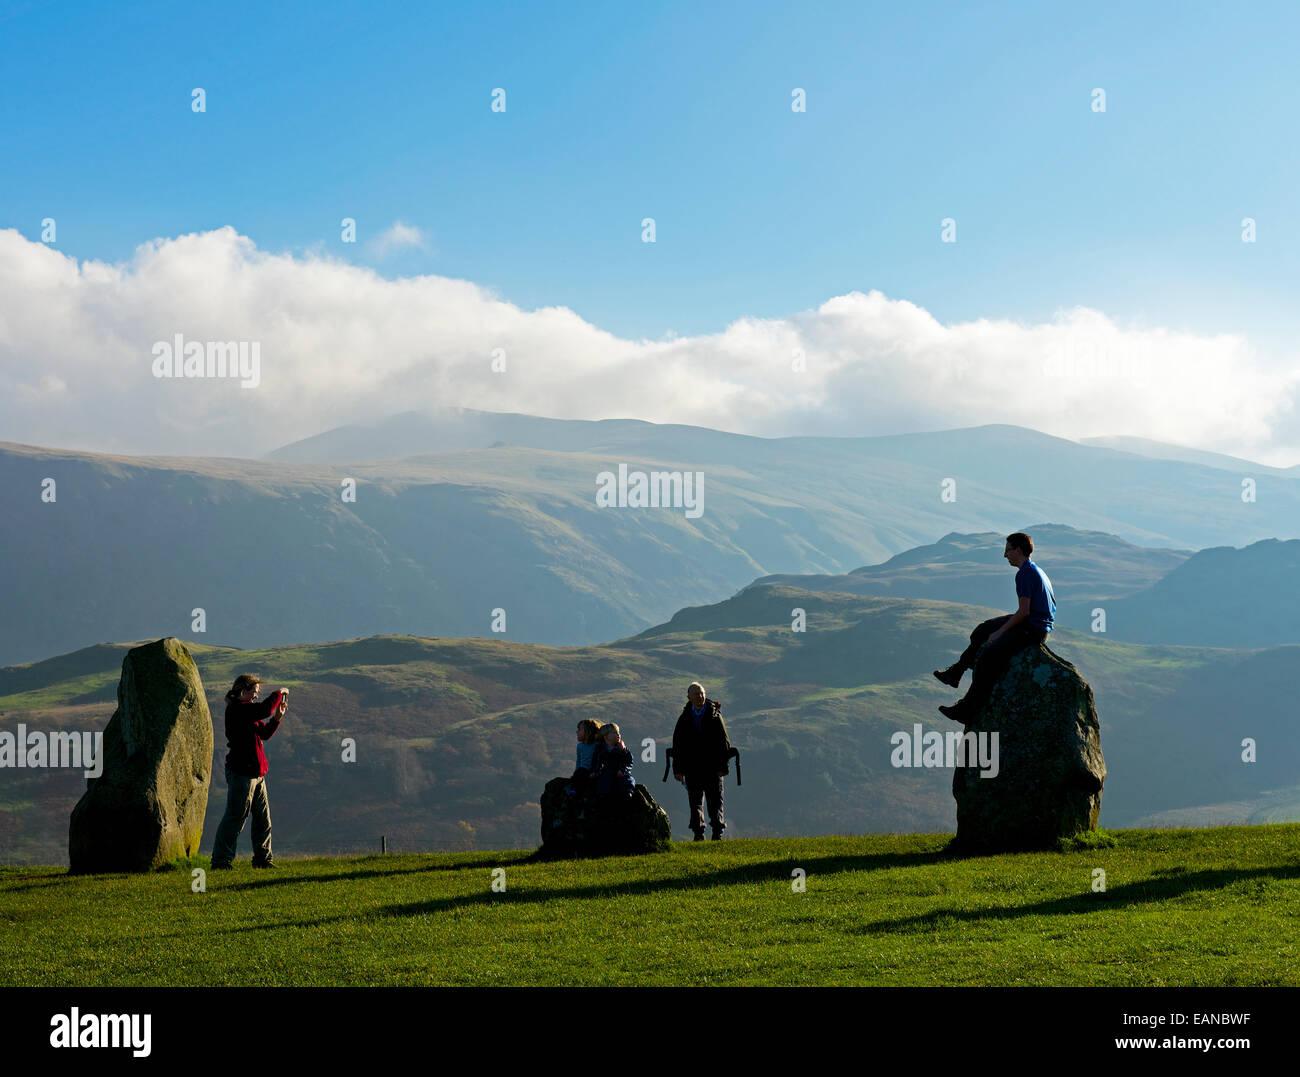 Castlerigg stone circle, near Keswick, Lake District National Park, Cumbria, England UK - Stock Image